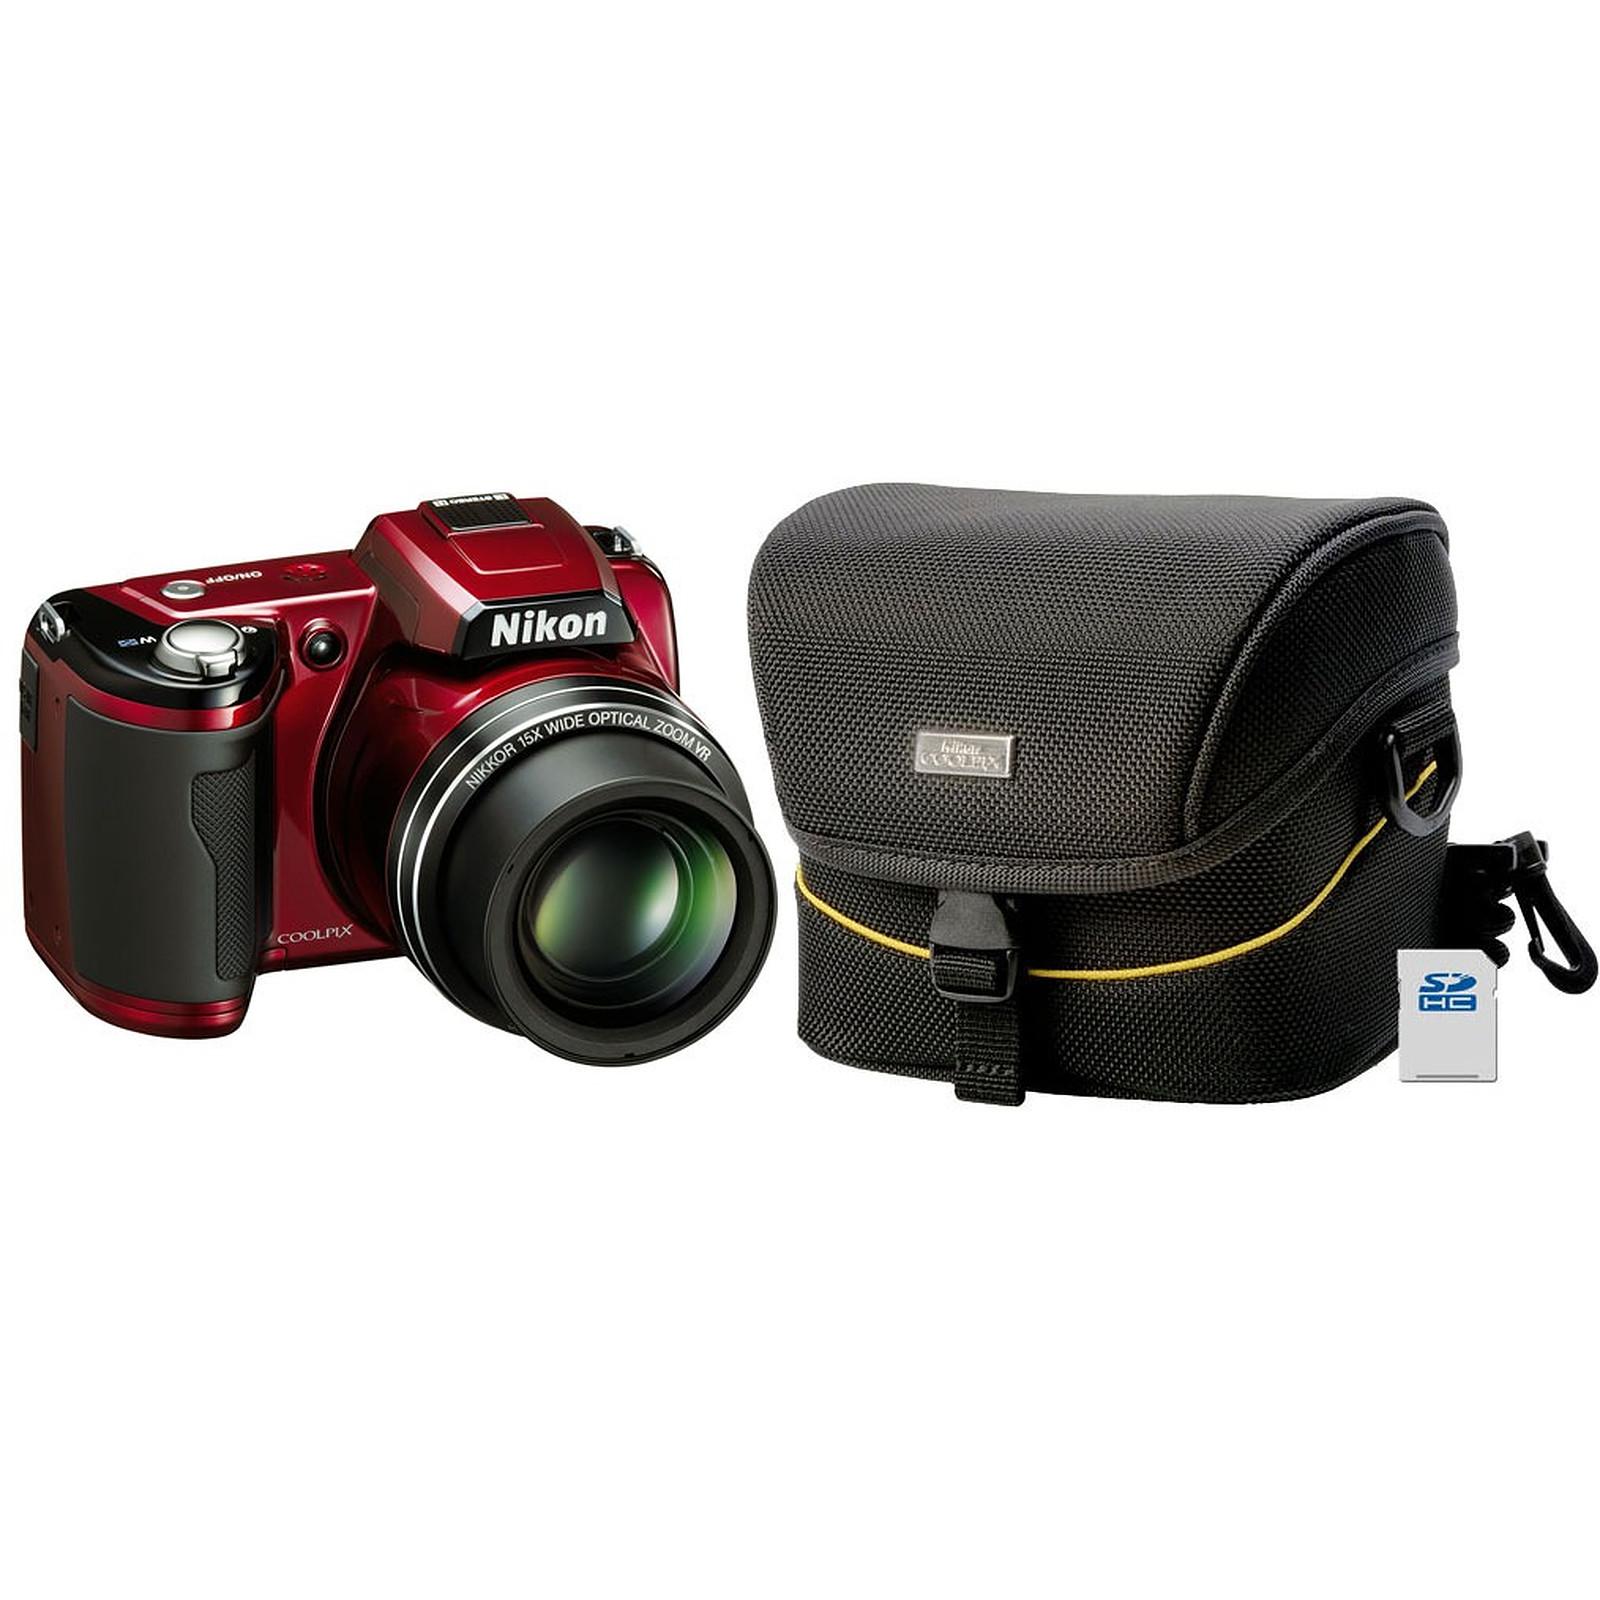 Nikon Coolpix L110 Rouge + Etui Nikon CS-P03 + Carte SD 4 Go